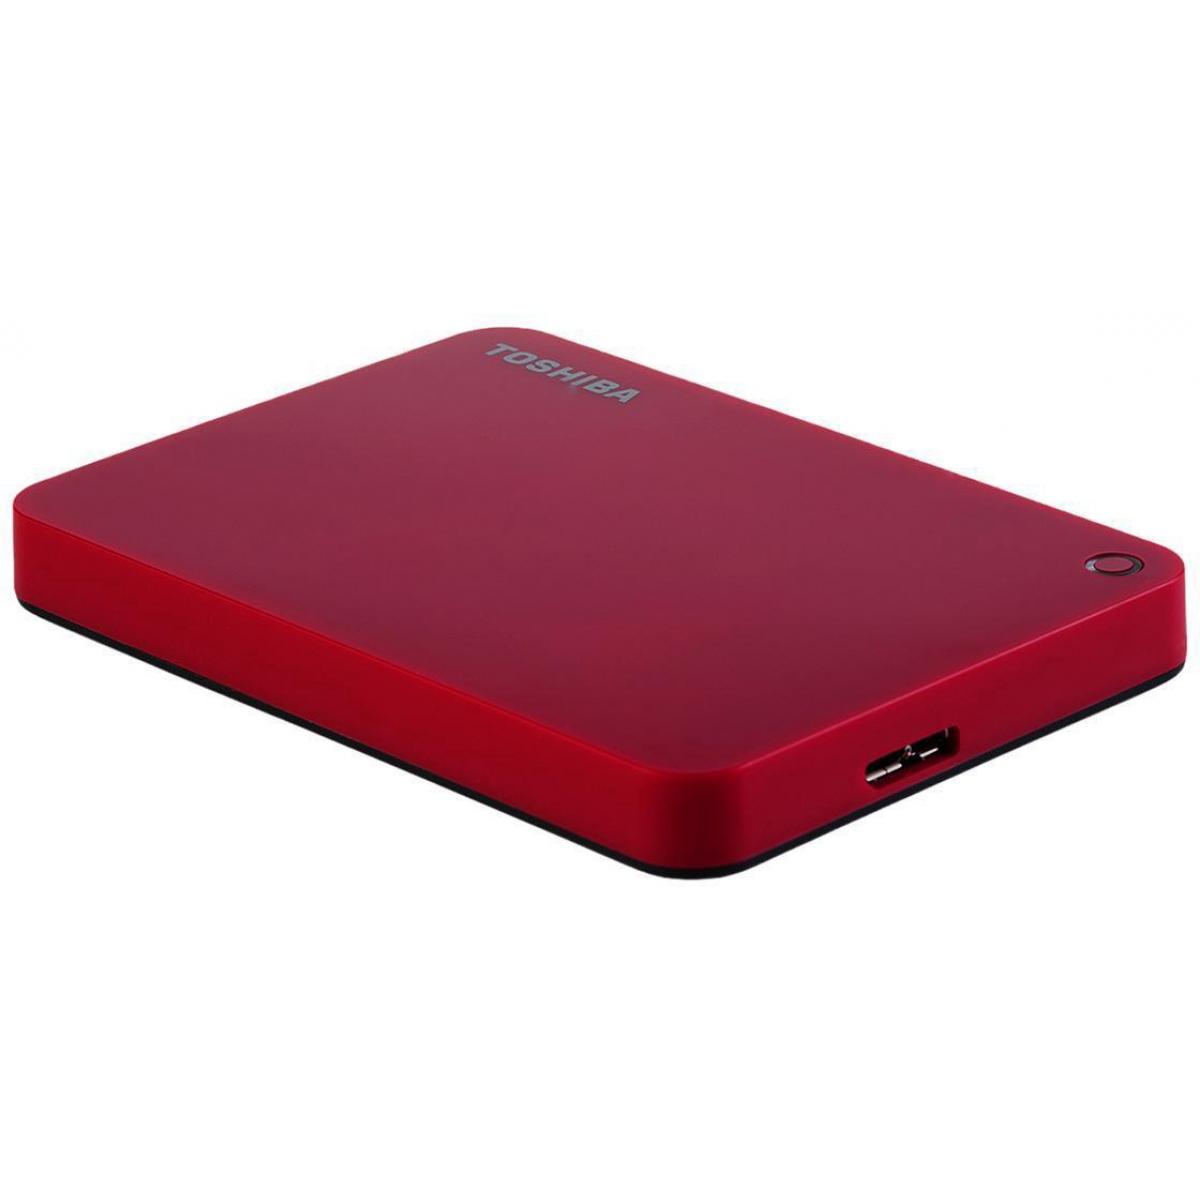 HD Externo Portátil Toshiba Canvio Advance 1TB HDTC910XR3AA USB 3.0 Vermelho